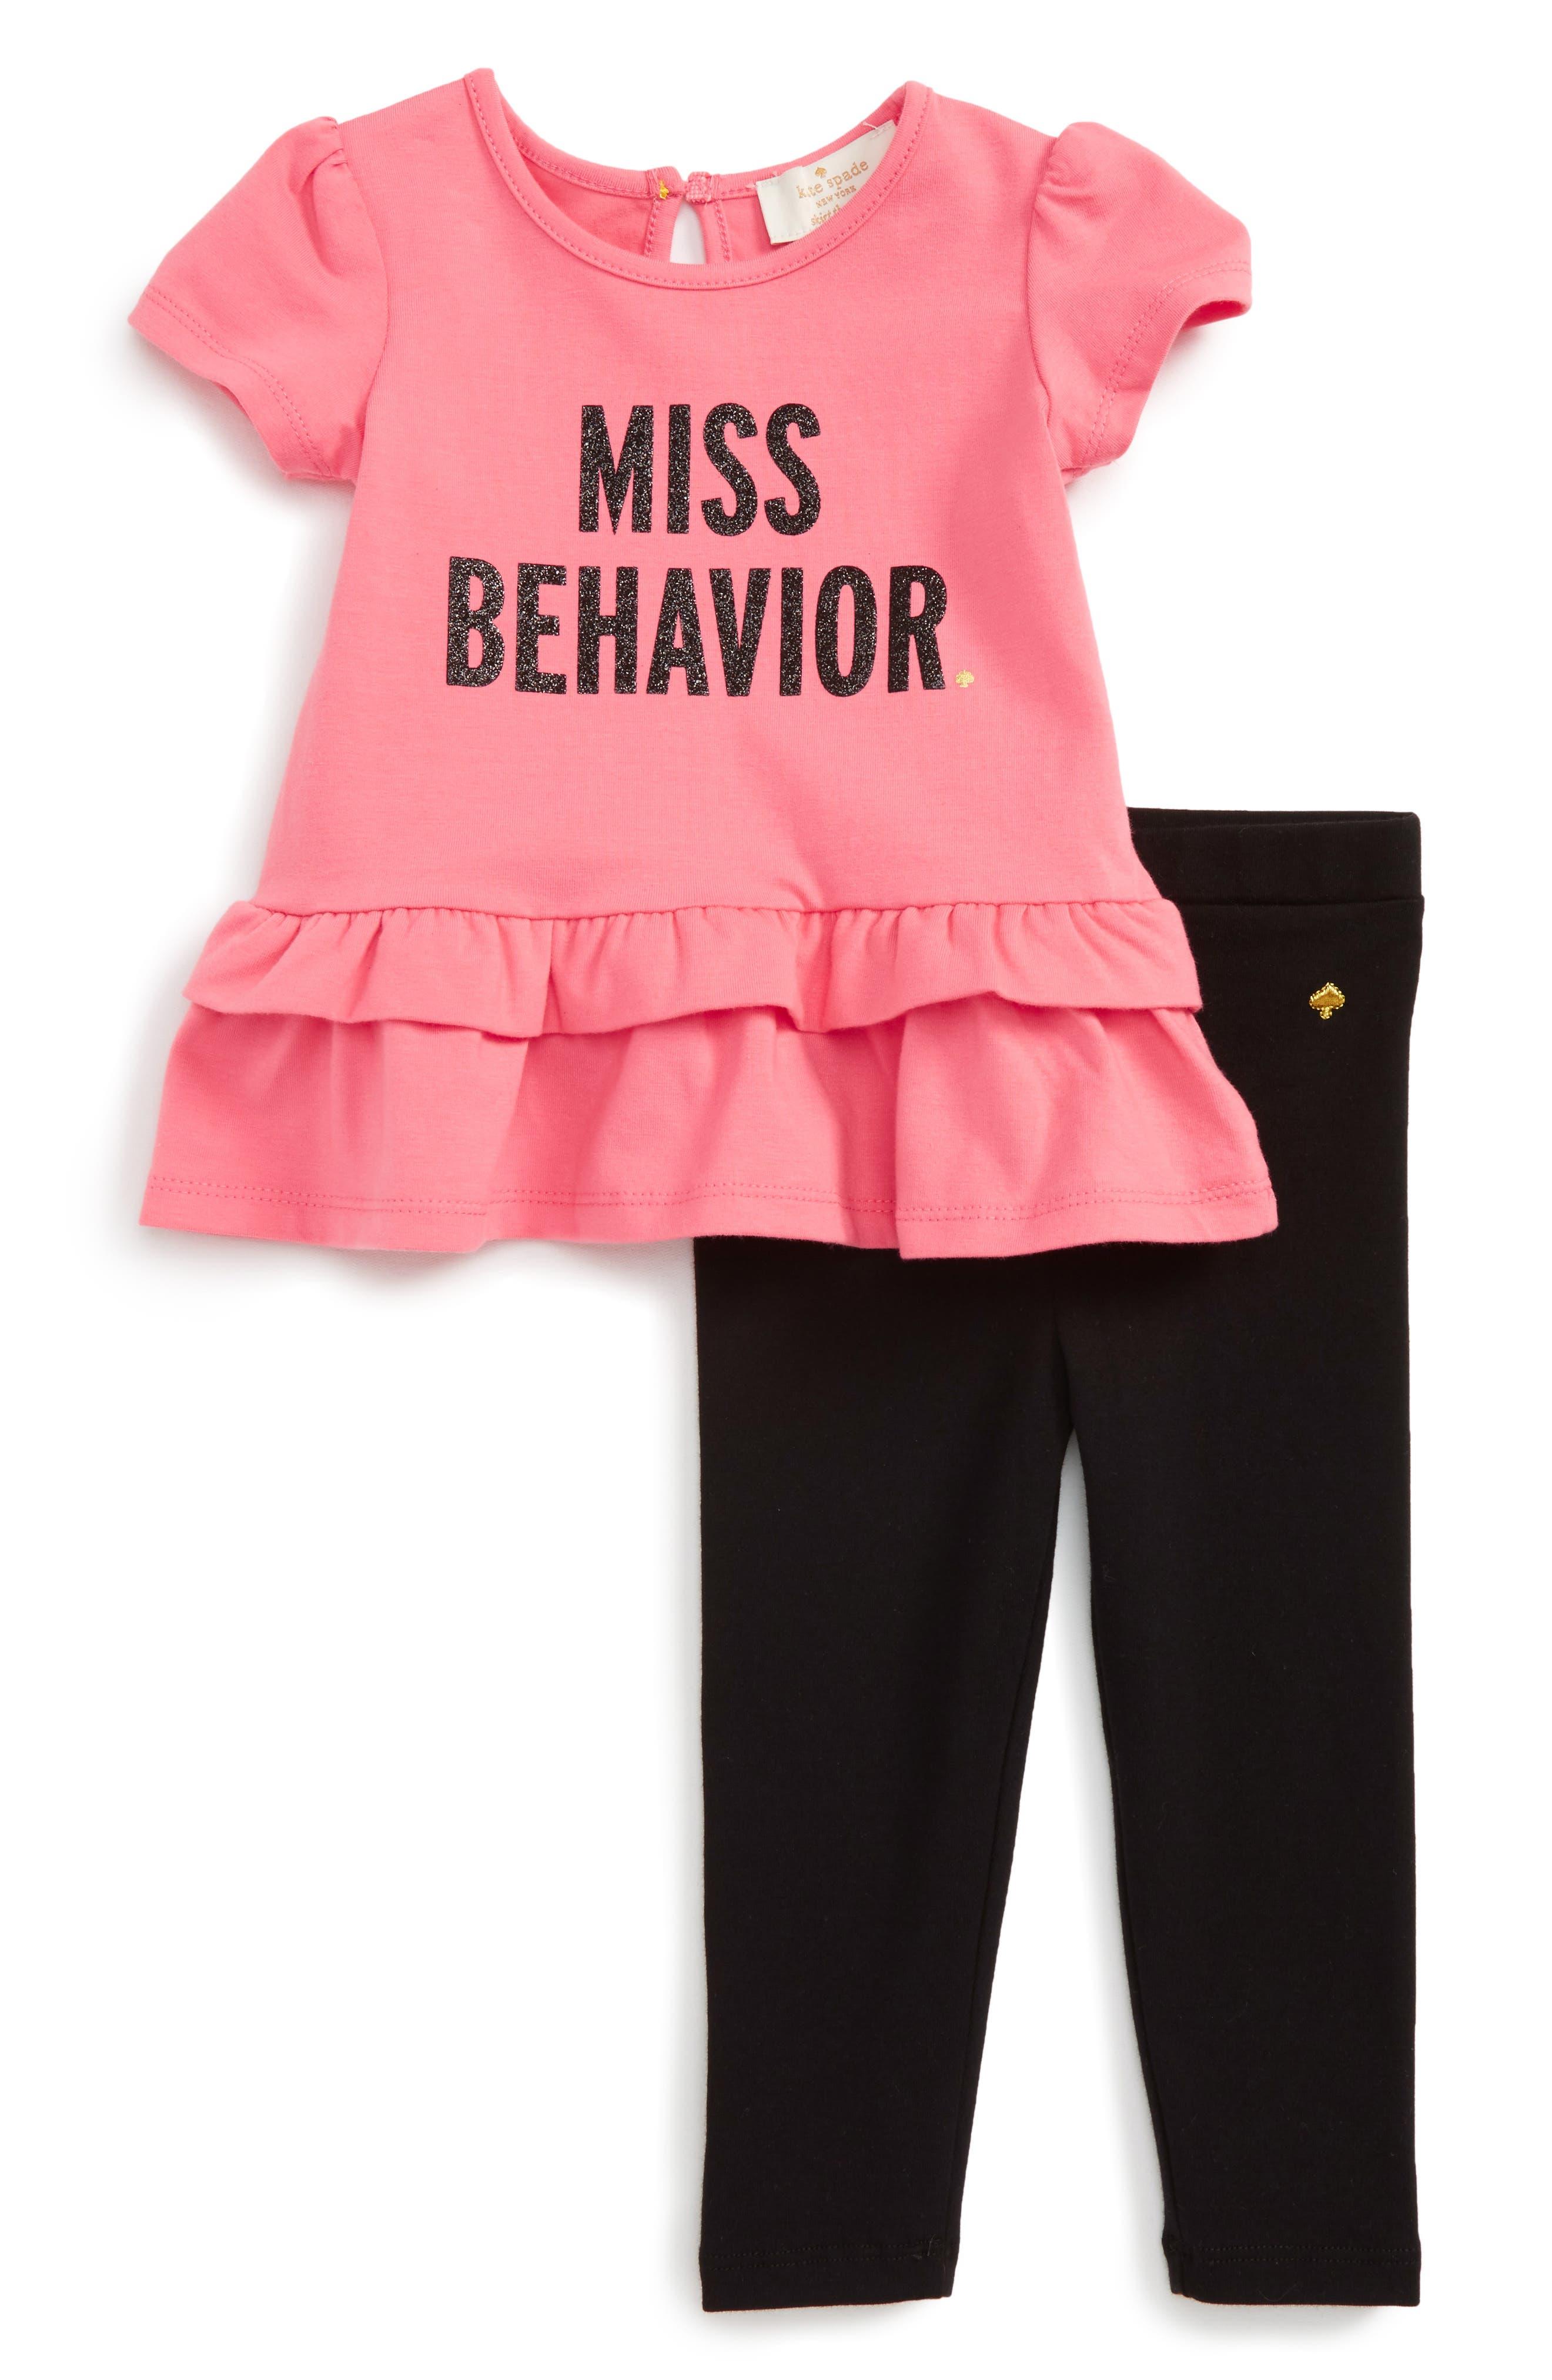 KATE SPADE NEW YORK miss behavior tee & leggings set